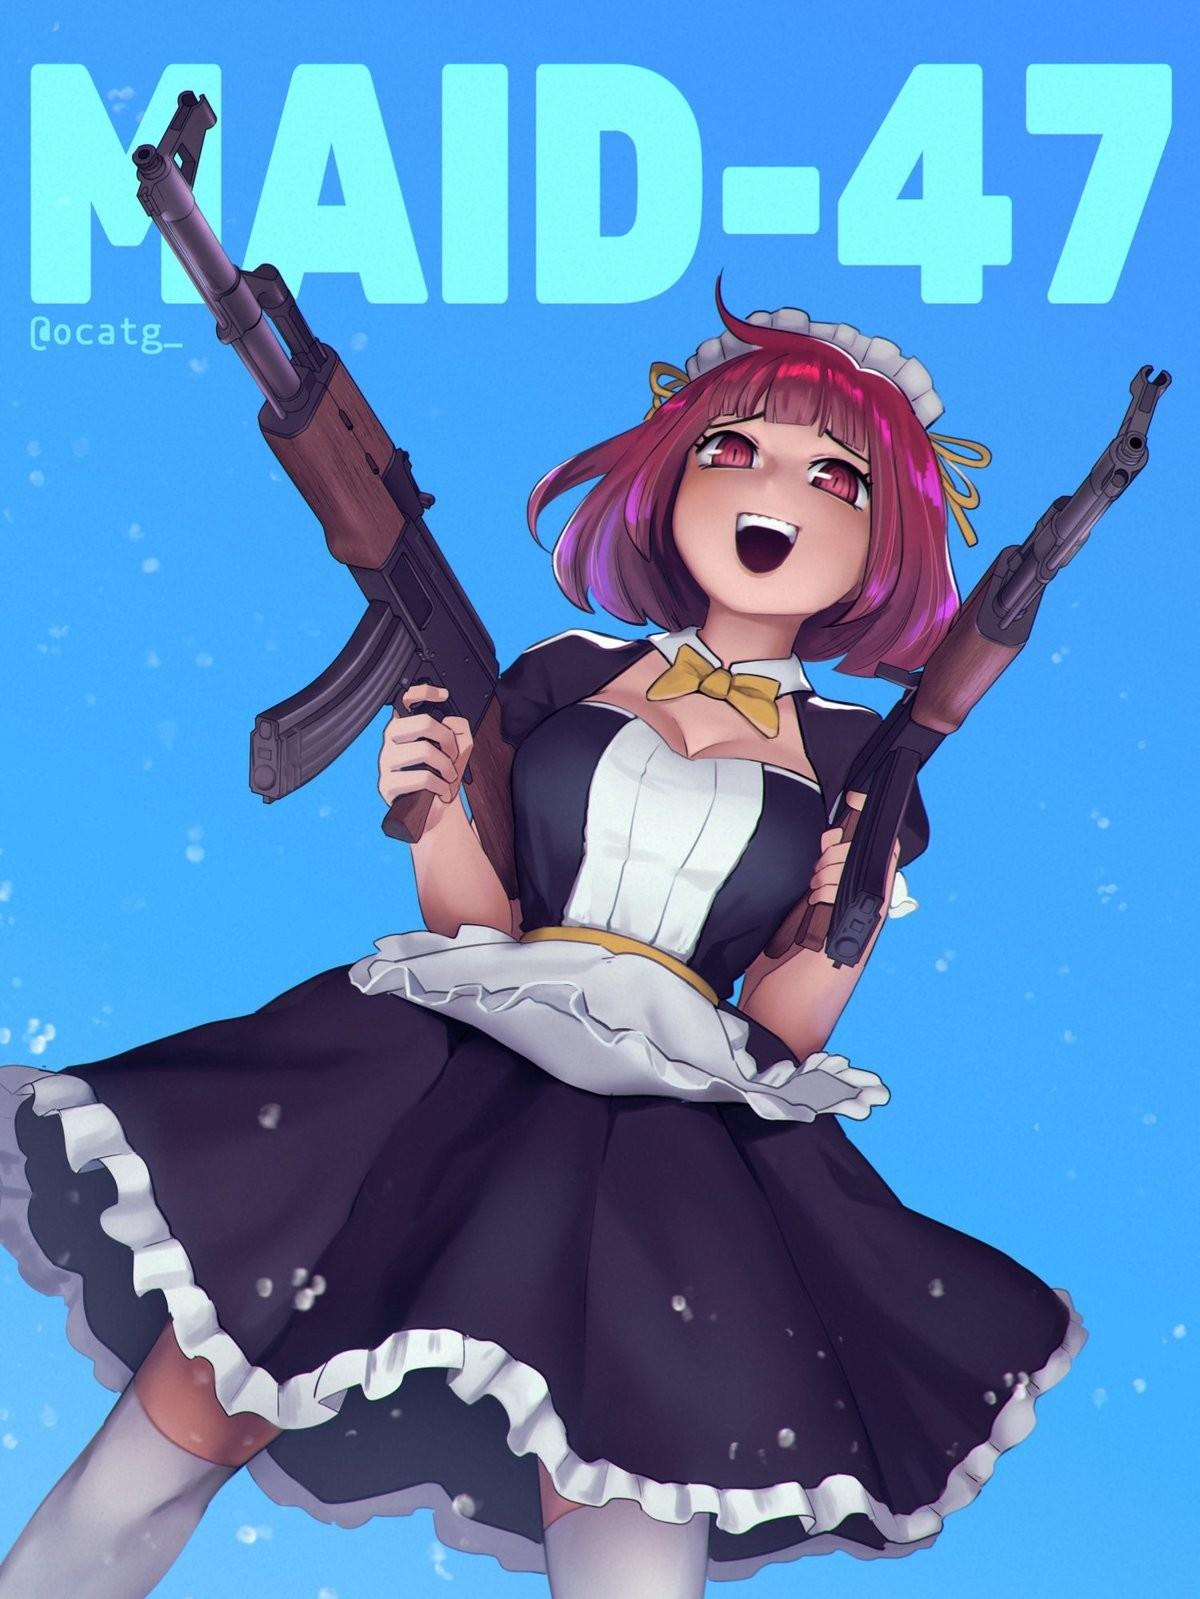 It's maid day. .. Is that Uraraka?